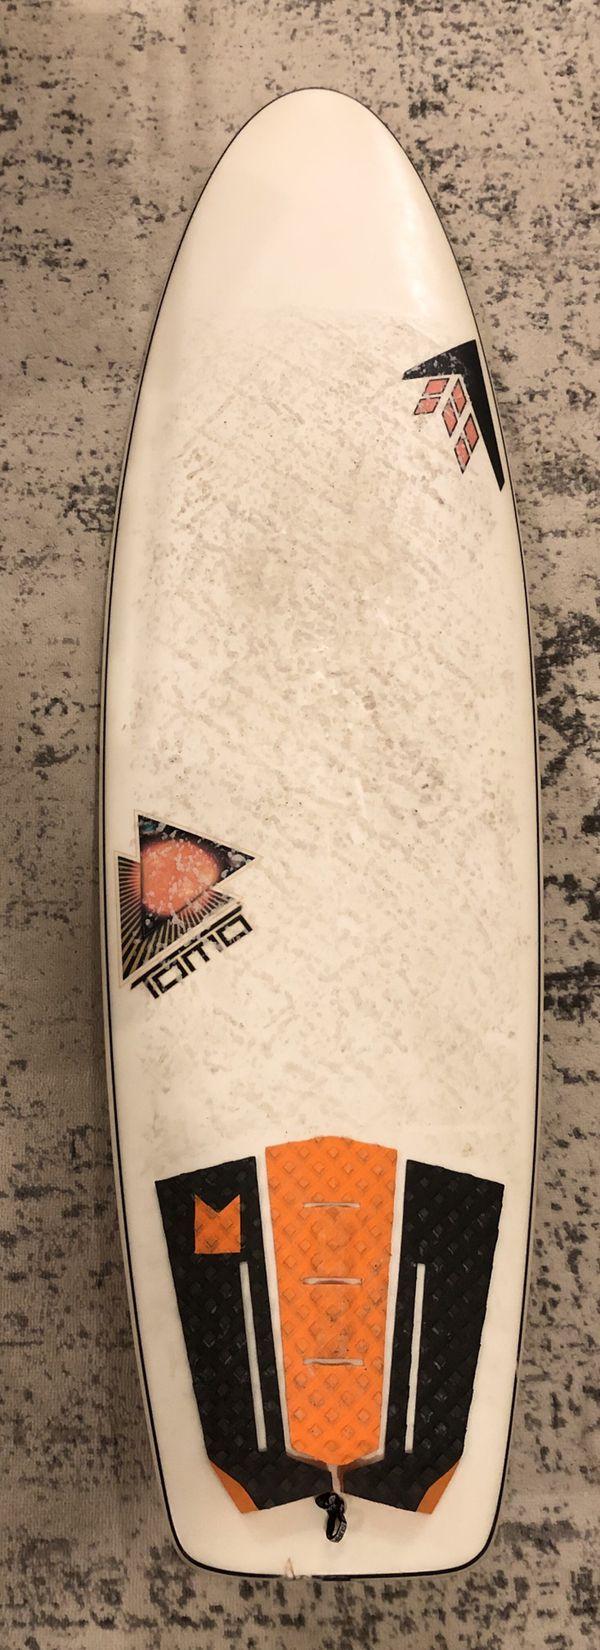 FireWire Nano surfboard